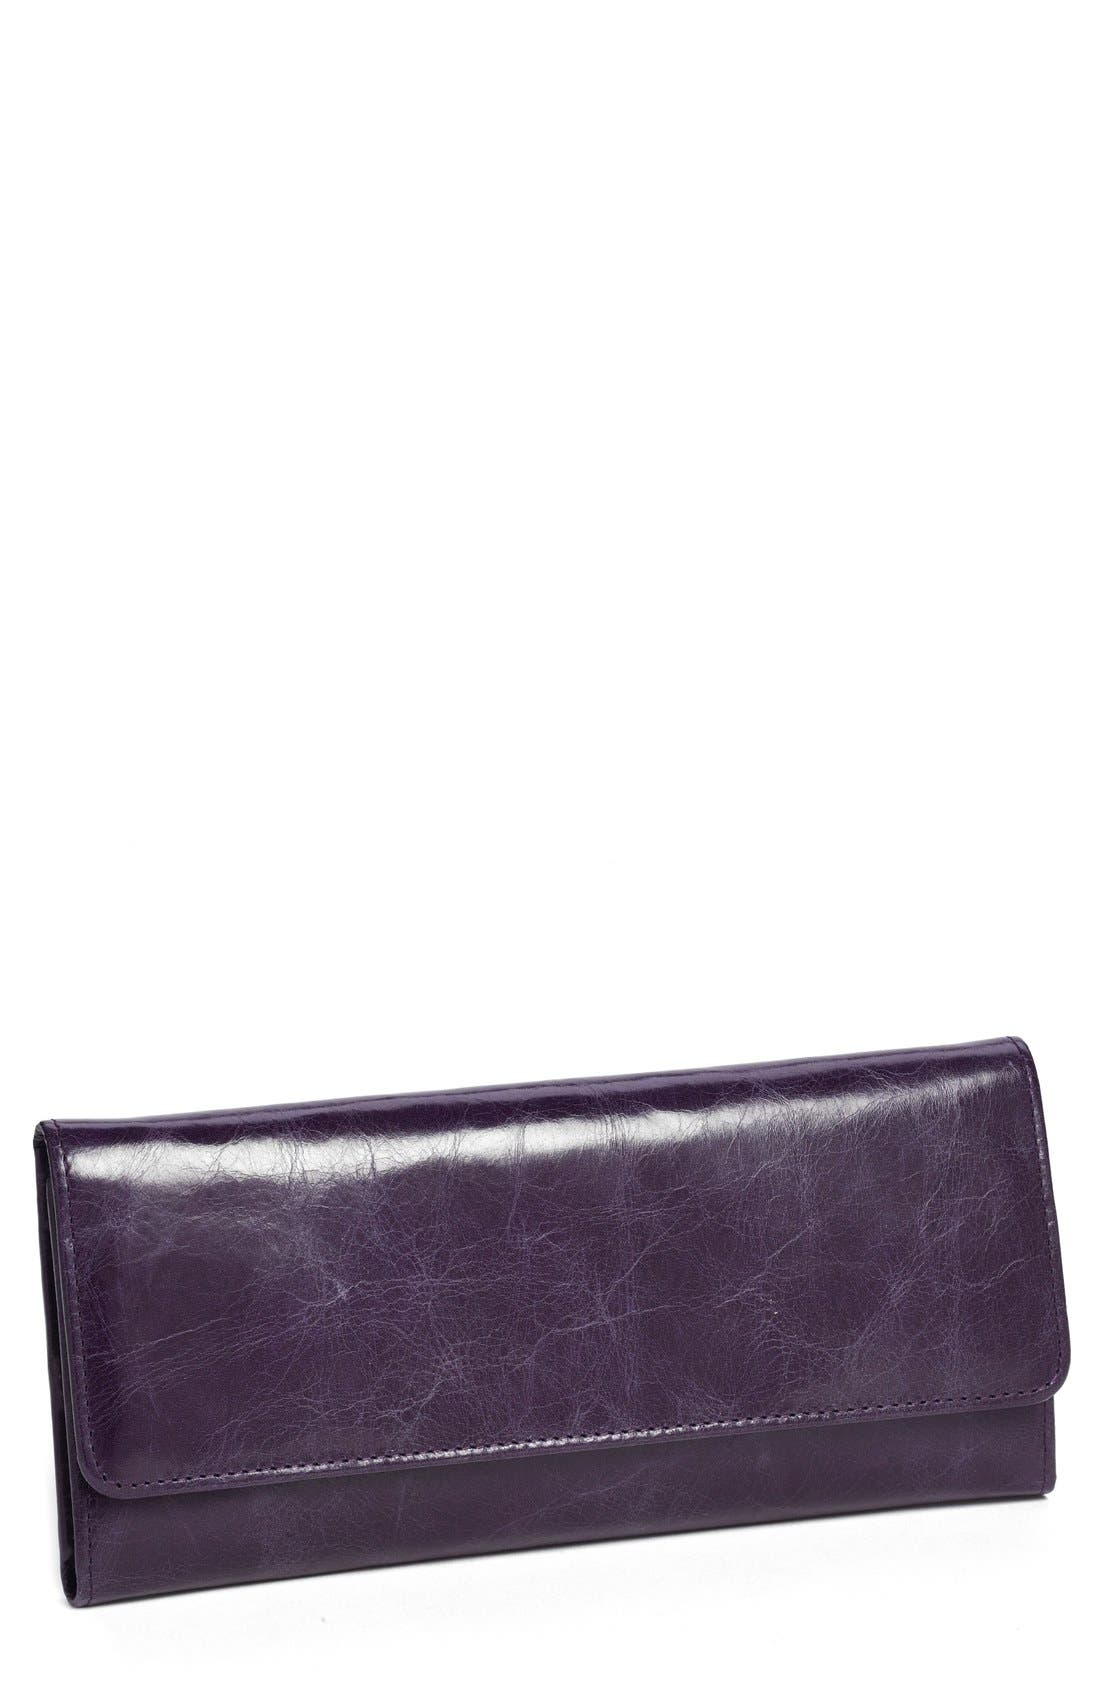 'Sadie' Leather Wallet,                             Main thumbnail 46, color,